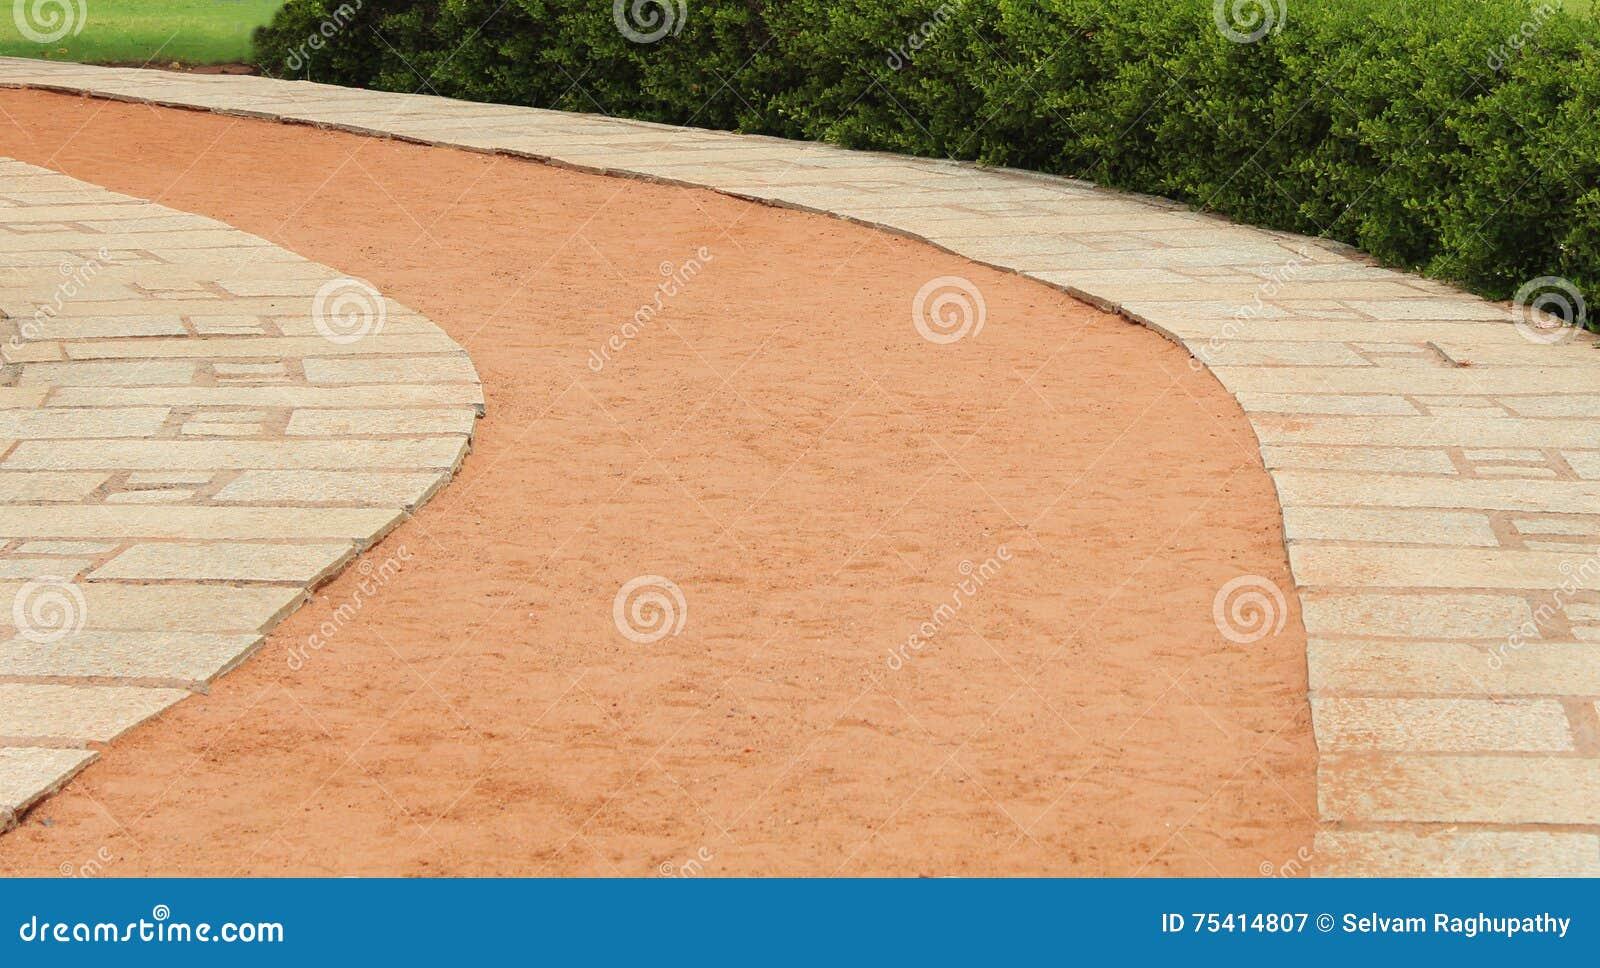 Beach curve stone path